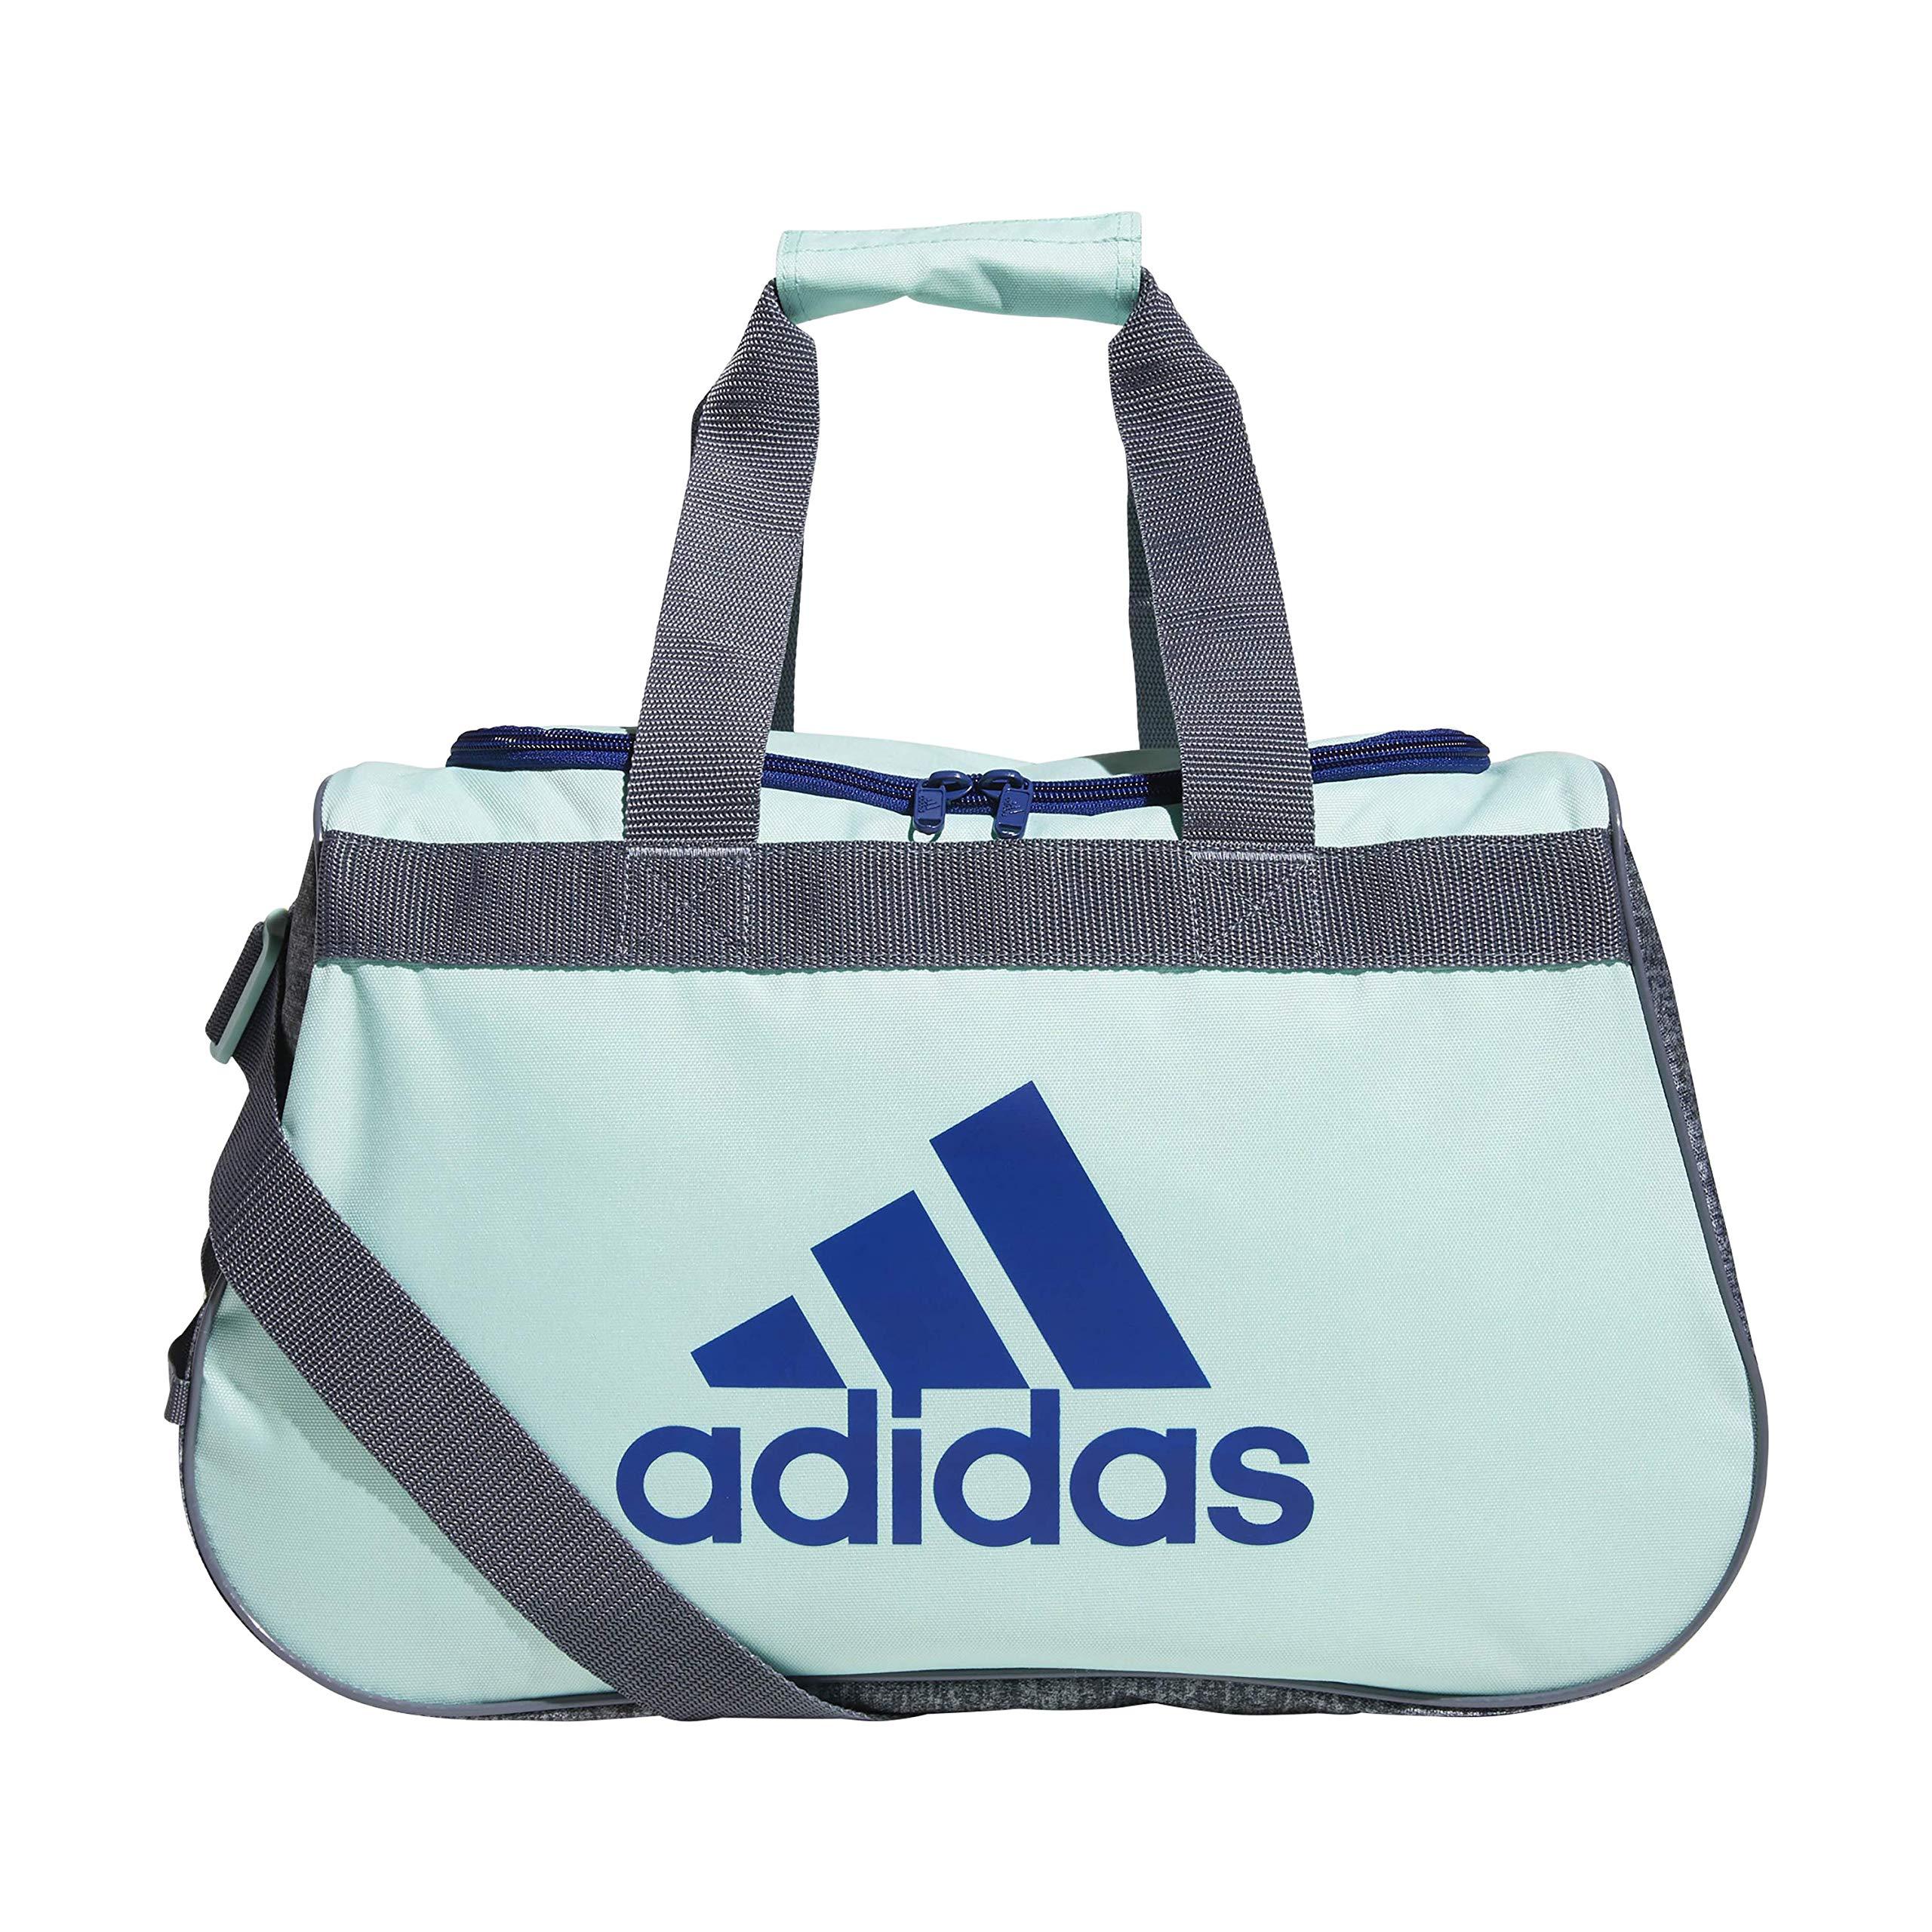 adidas Unisex Diablo Small Duffel Bag, Clear Mint Green/Mystery Ink Blue/Onix/ Onix Jerse, ONE SIZE by adidas